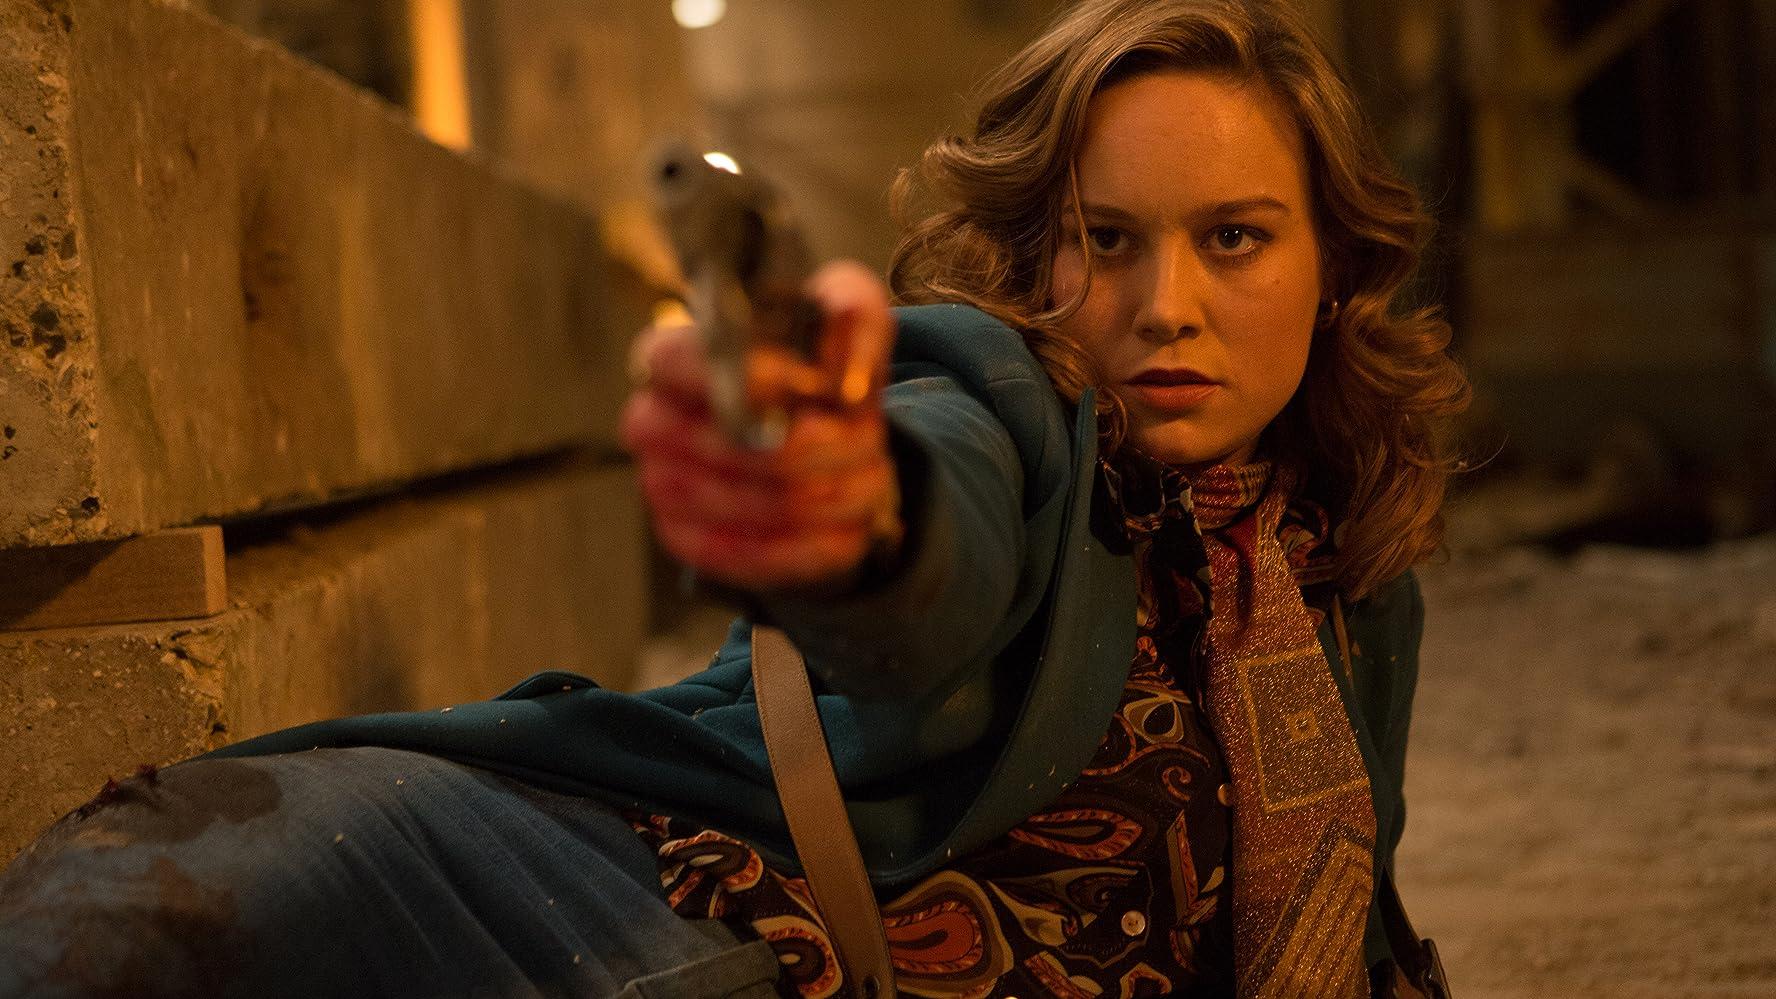 Brie Larson in Free Fire (2016)